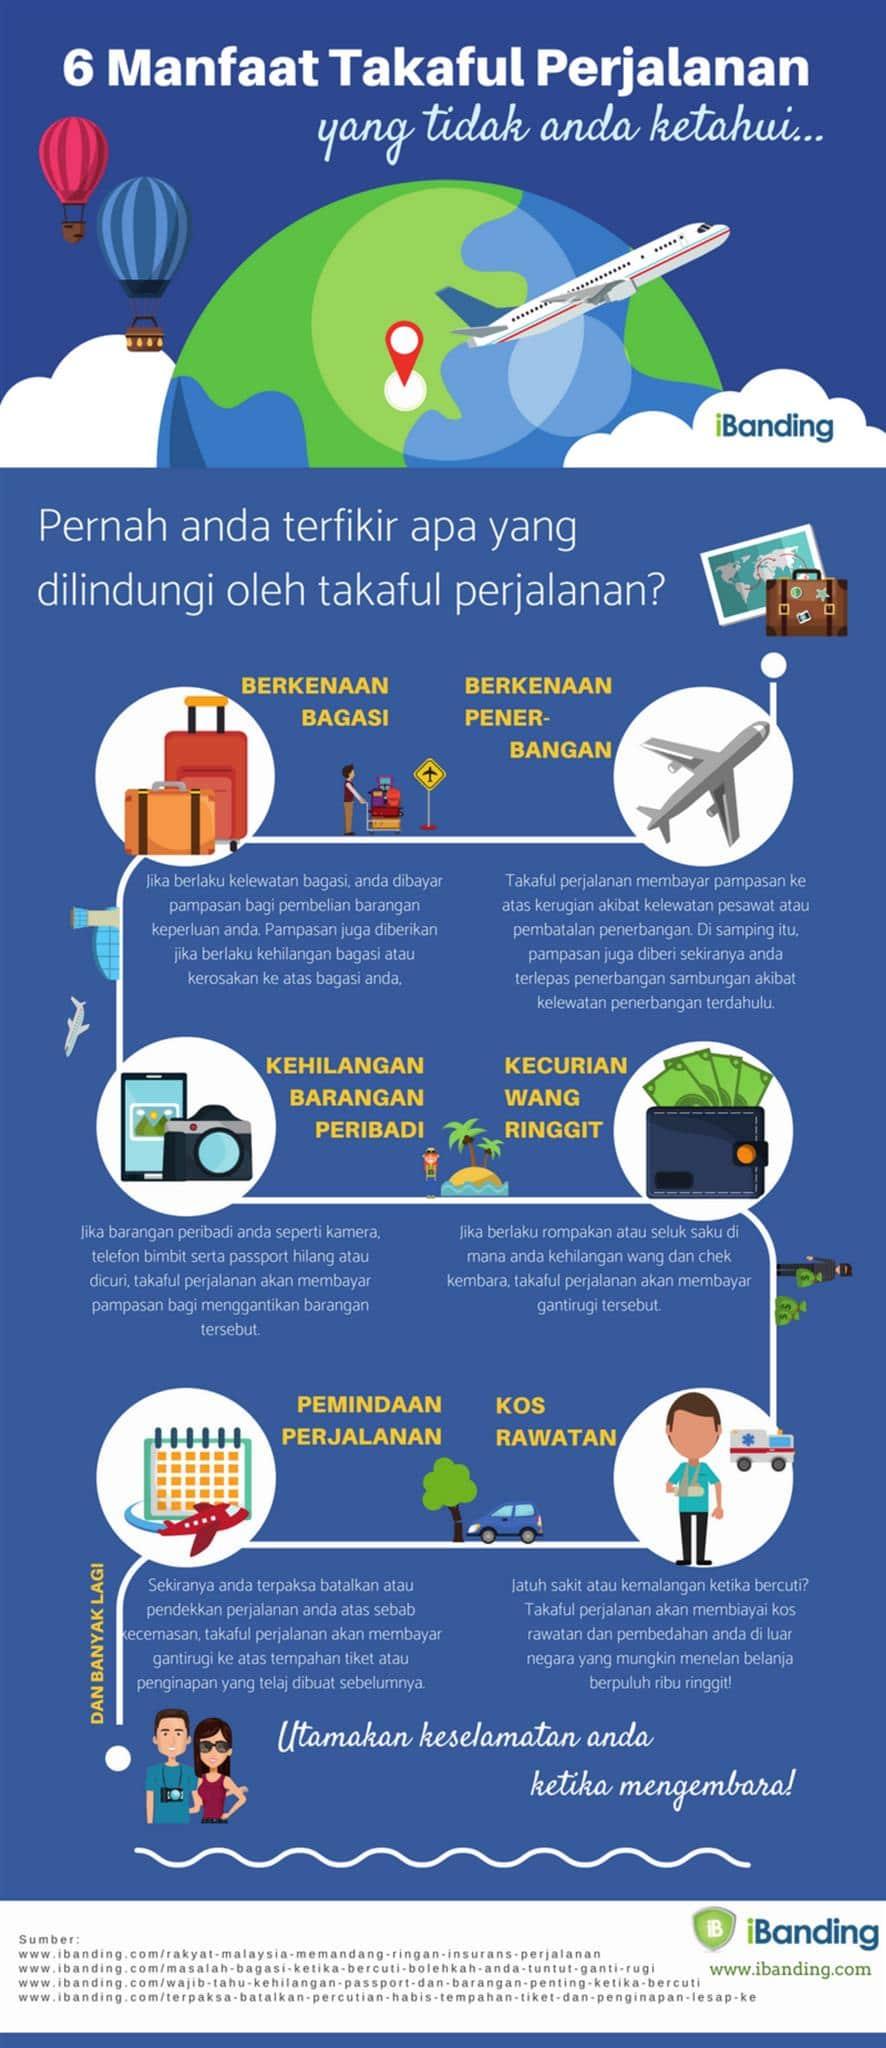 Manfaat takaful perjalanan infografik